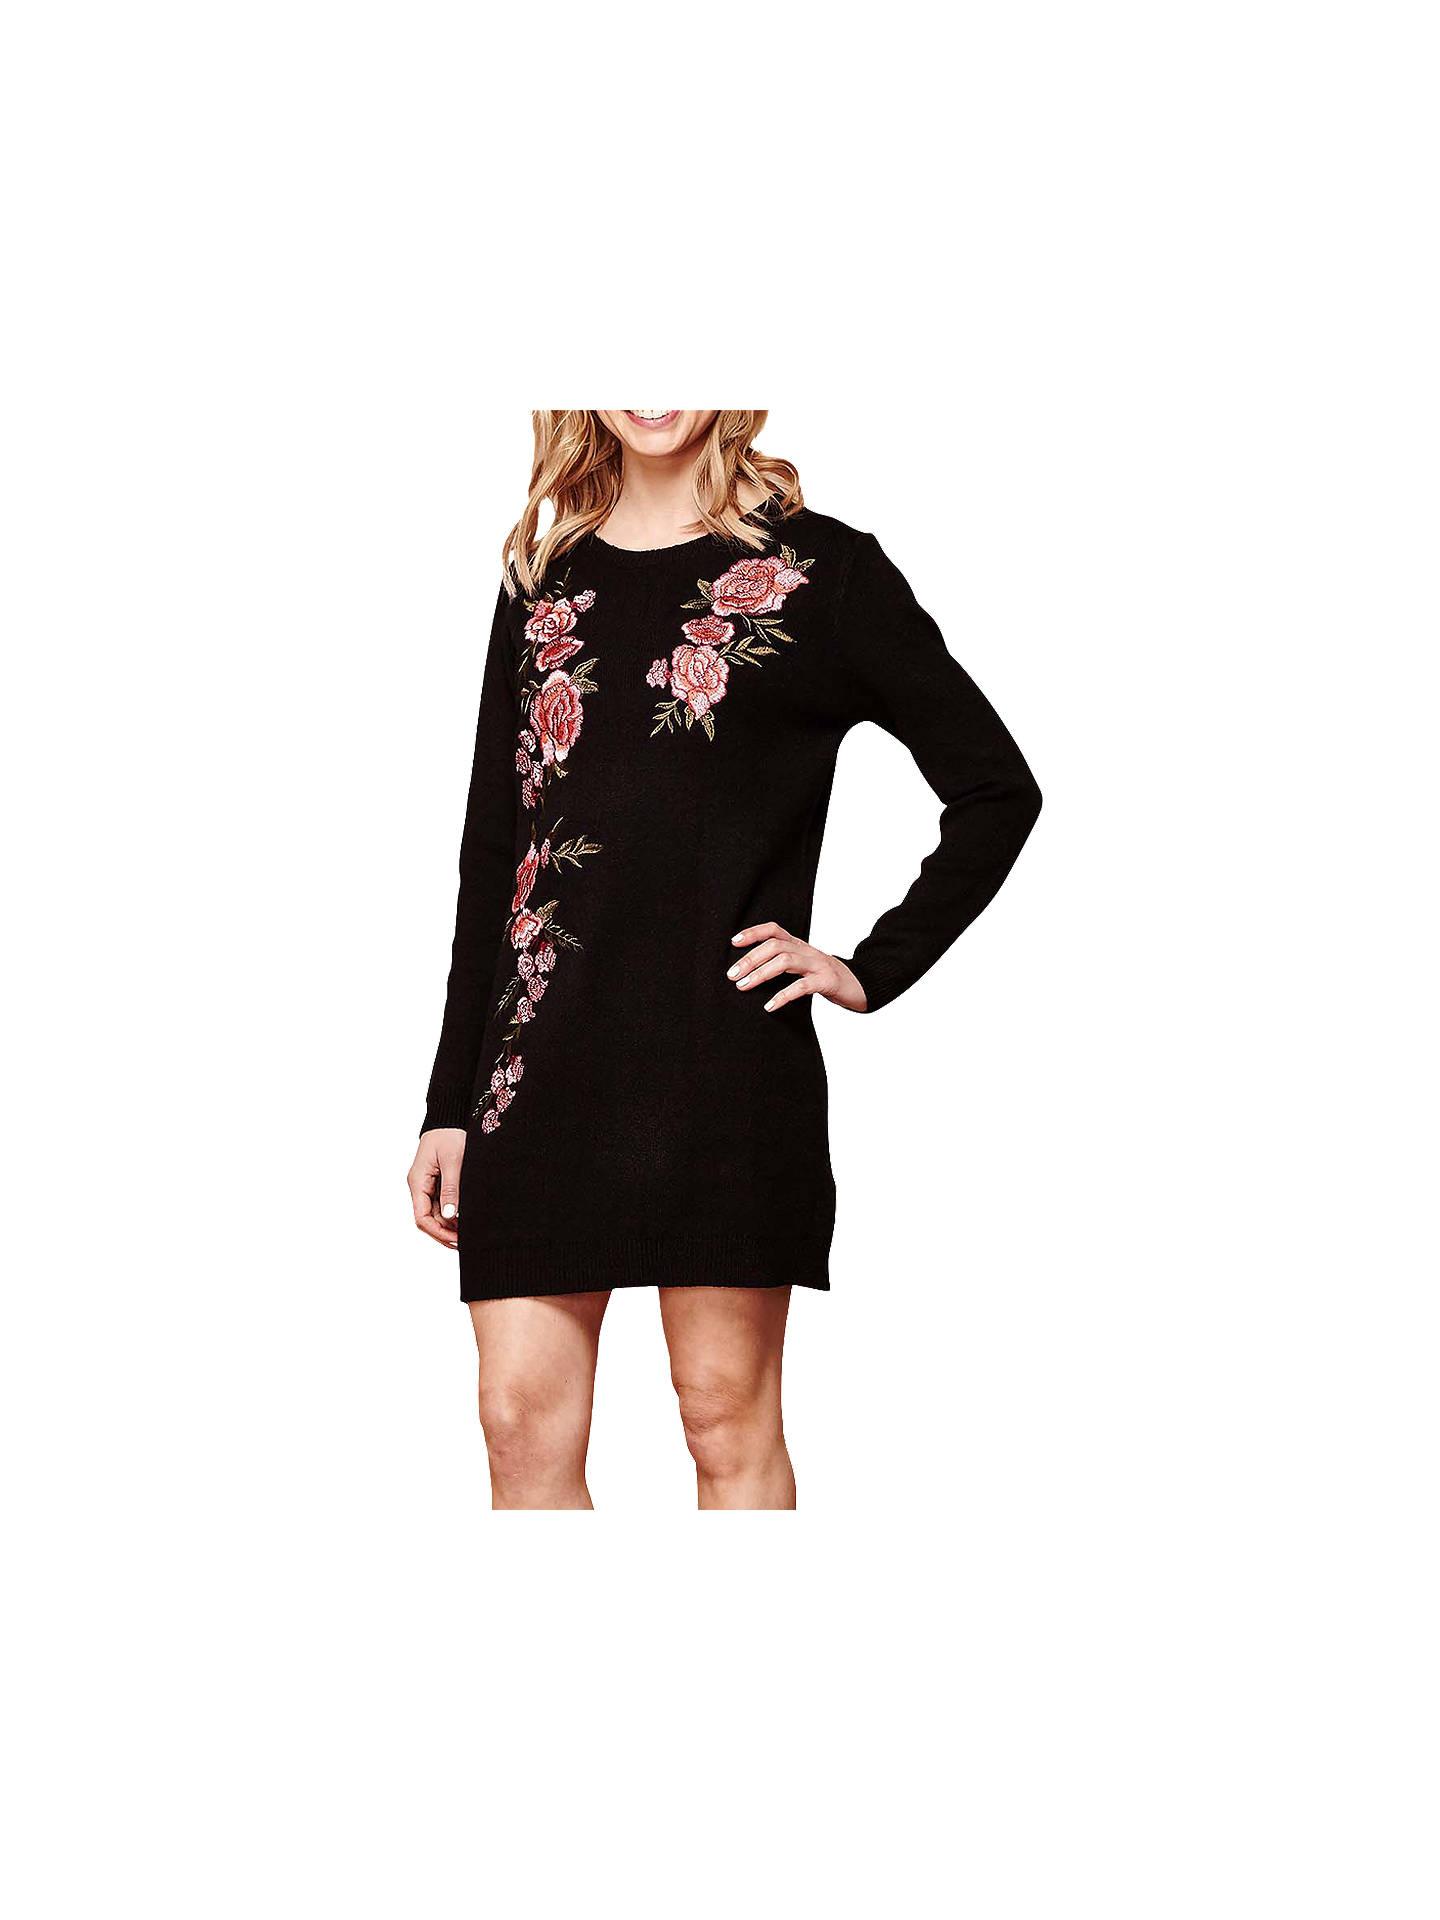 6e5ba652152 ... Buy Yumi Embroidered Jumper Dress